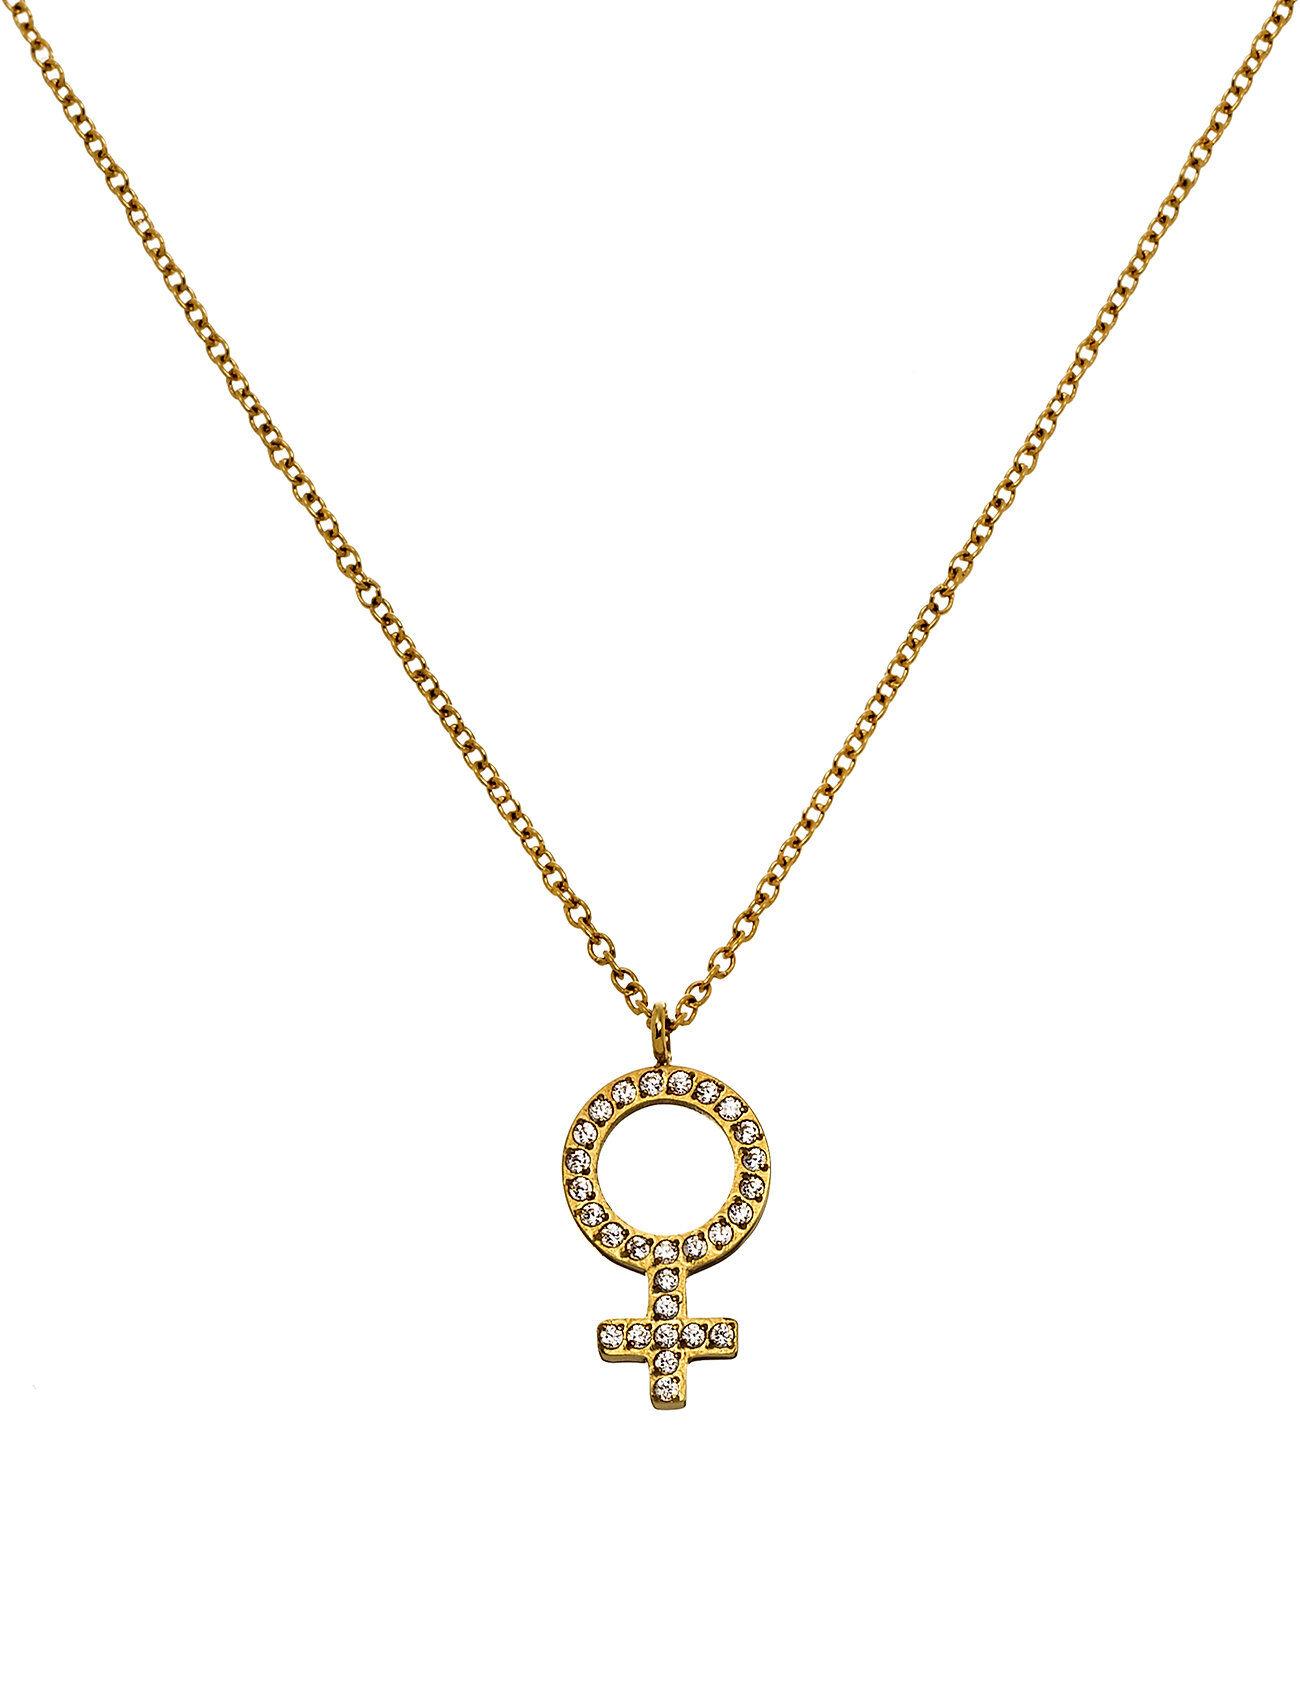 Edblad Me Necklace Gold Accessories Jewellery Necklaces Dainty Necklaces Kulta Edblad